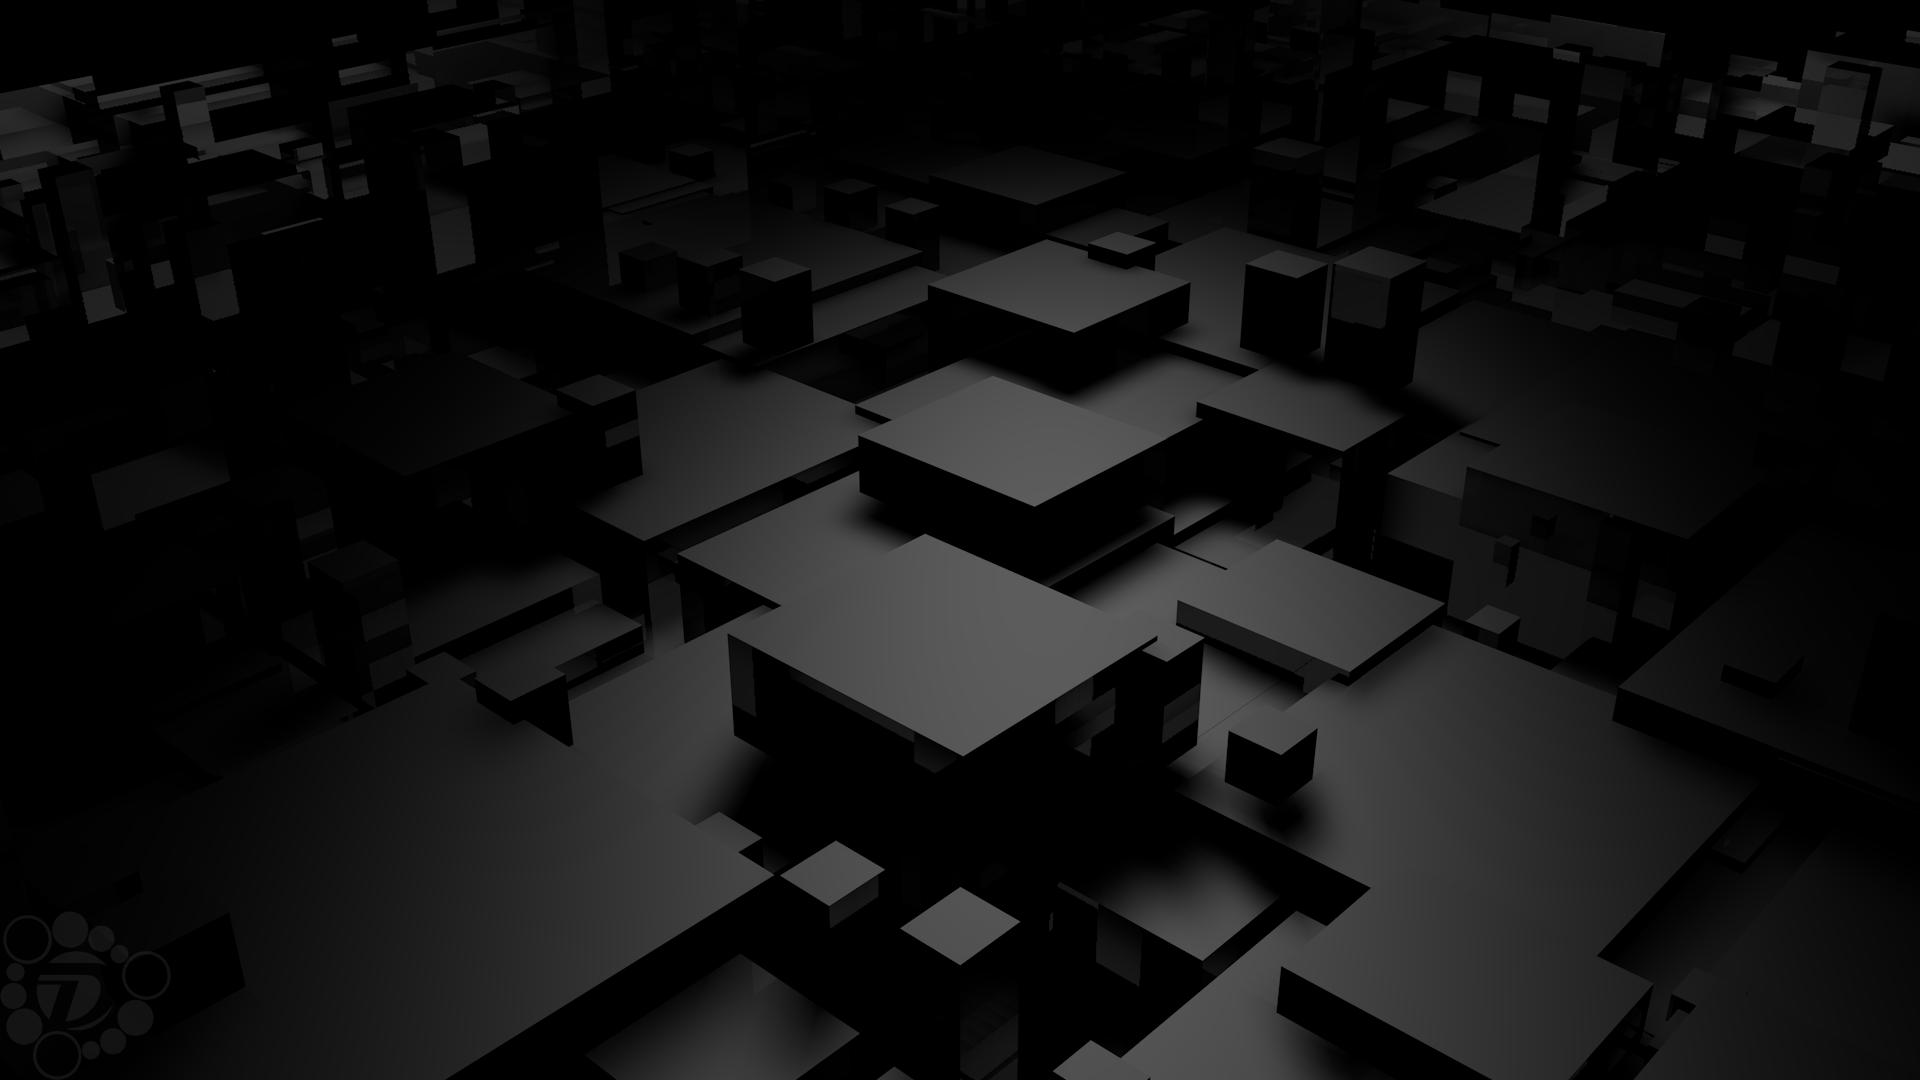 General 1920x1080 monochrome abstract digital art